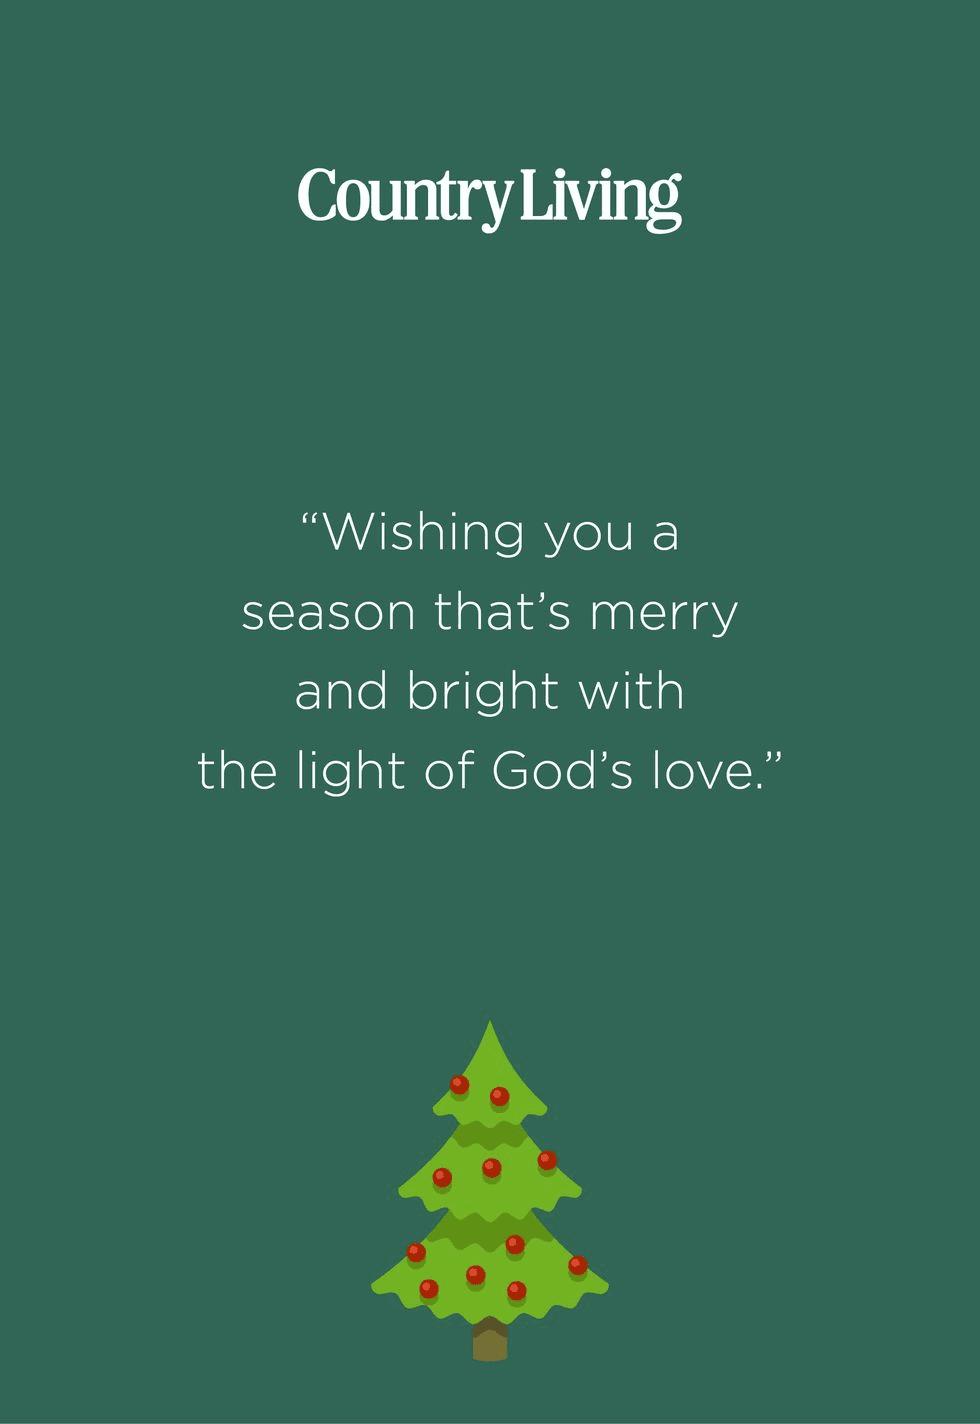 Mery Christmas Wishes 4